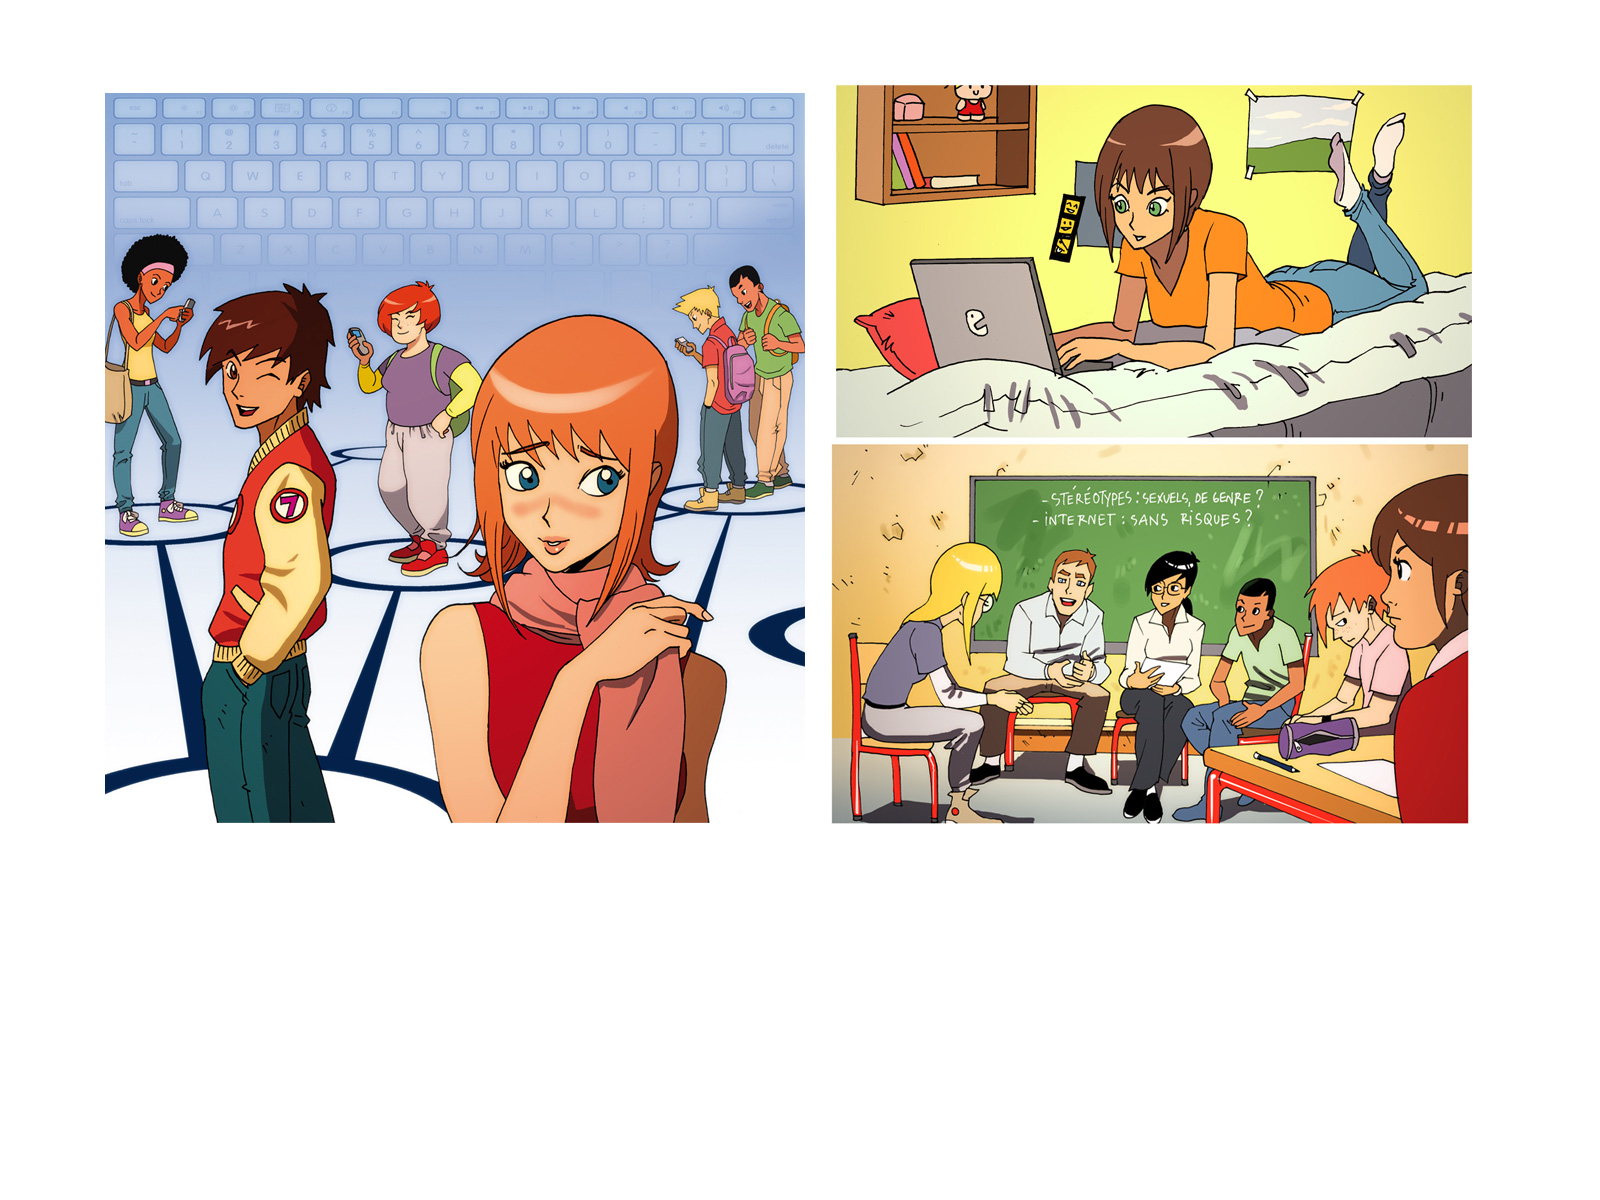 illustrations-alfonsorecio-4973